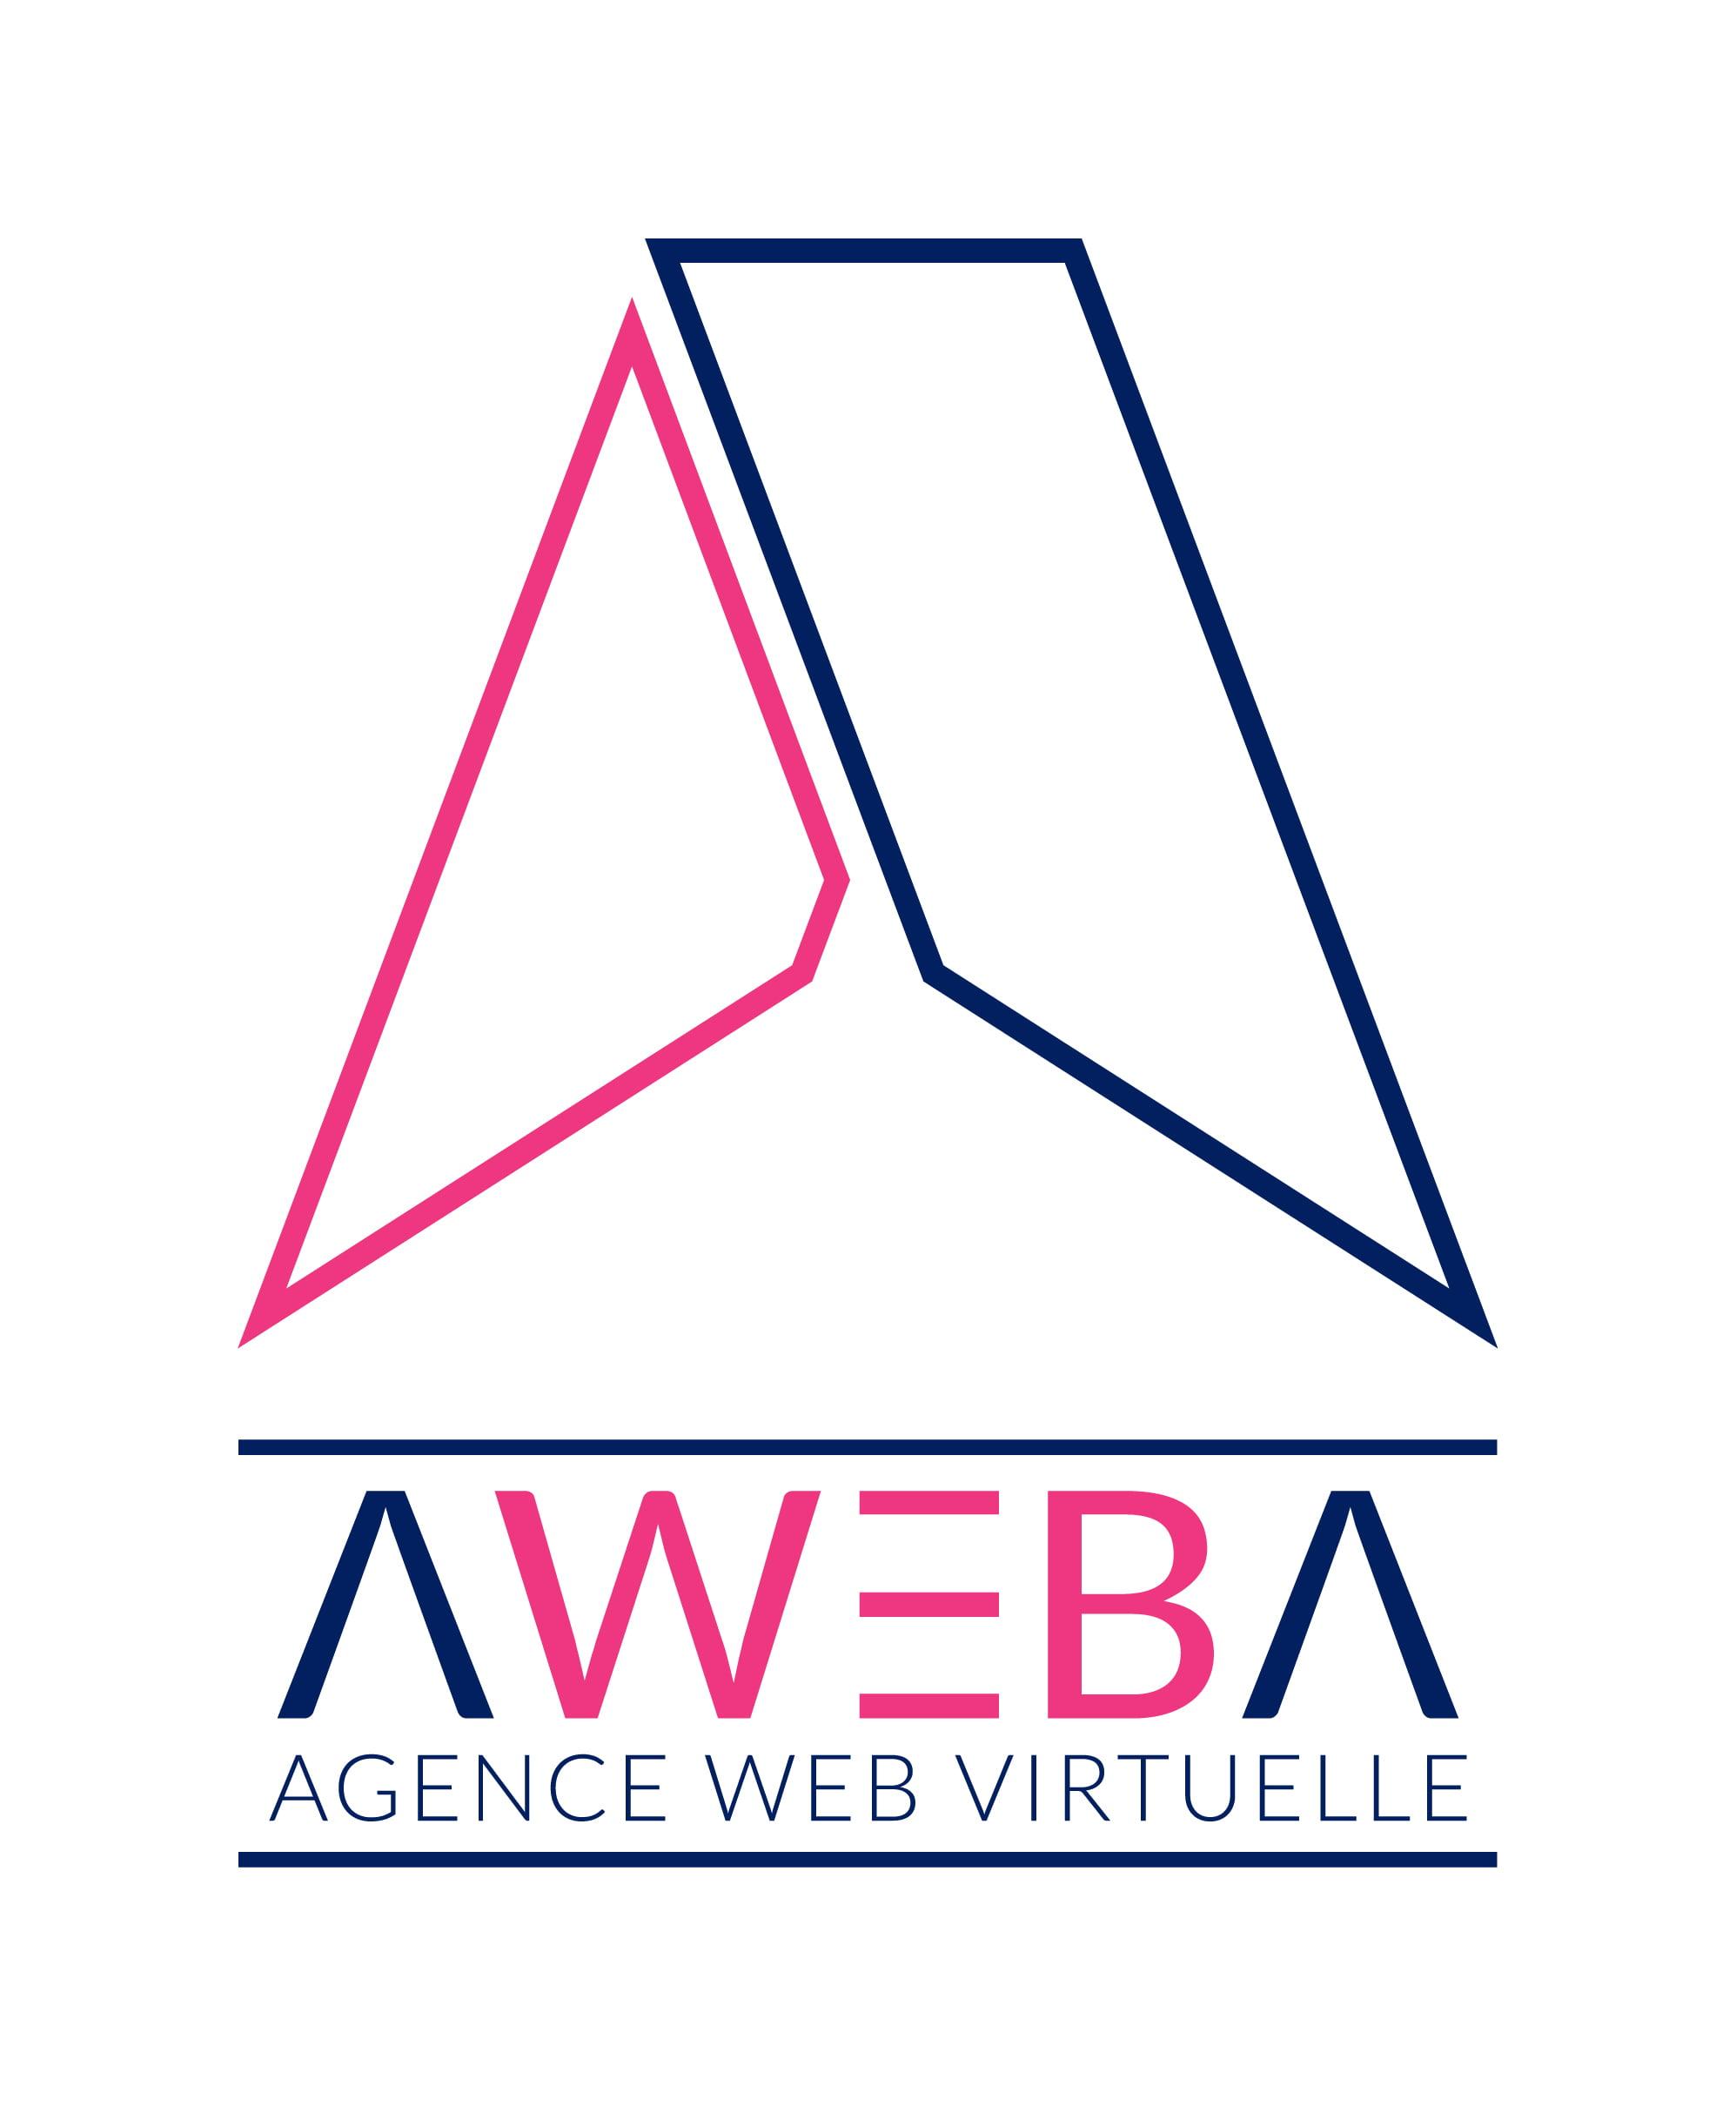 aweba-logo-new-final-fr-vt-rgb-coul